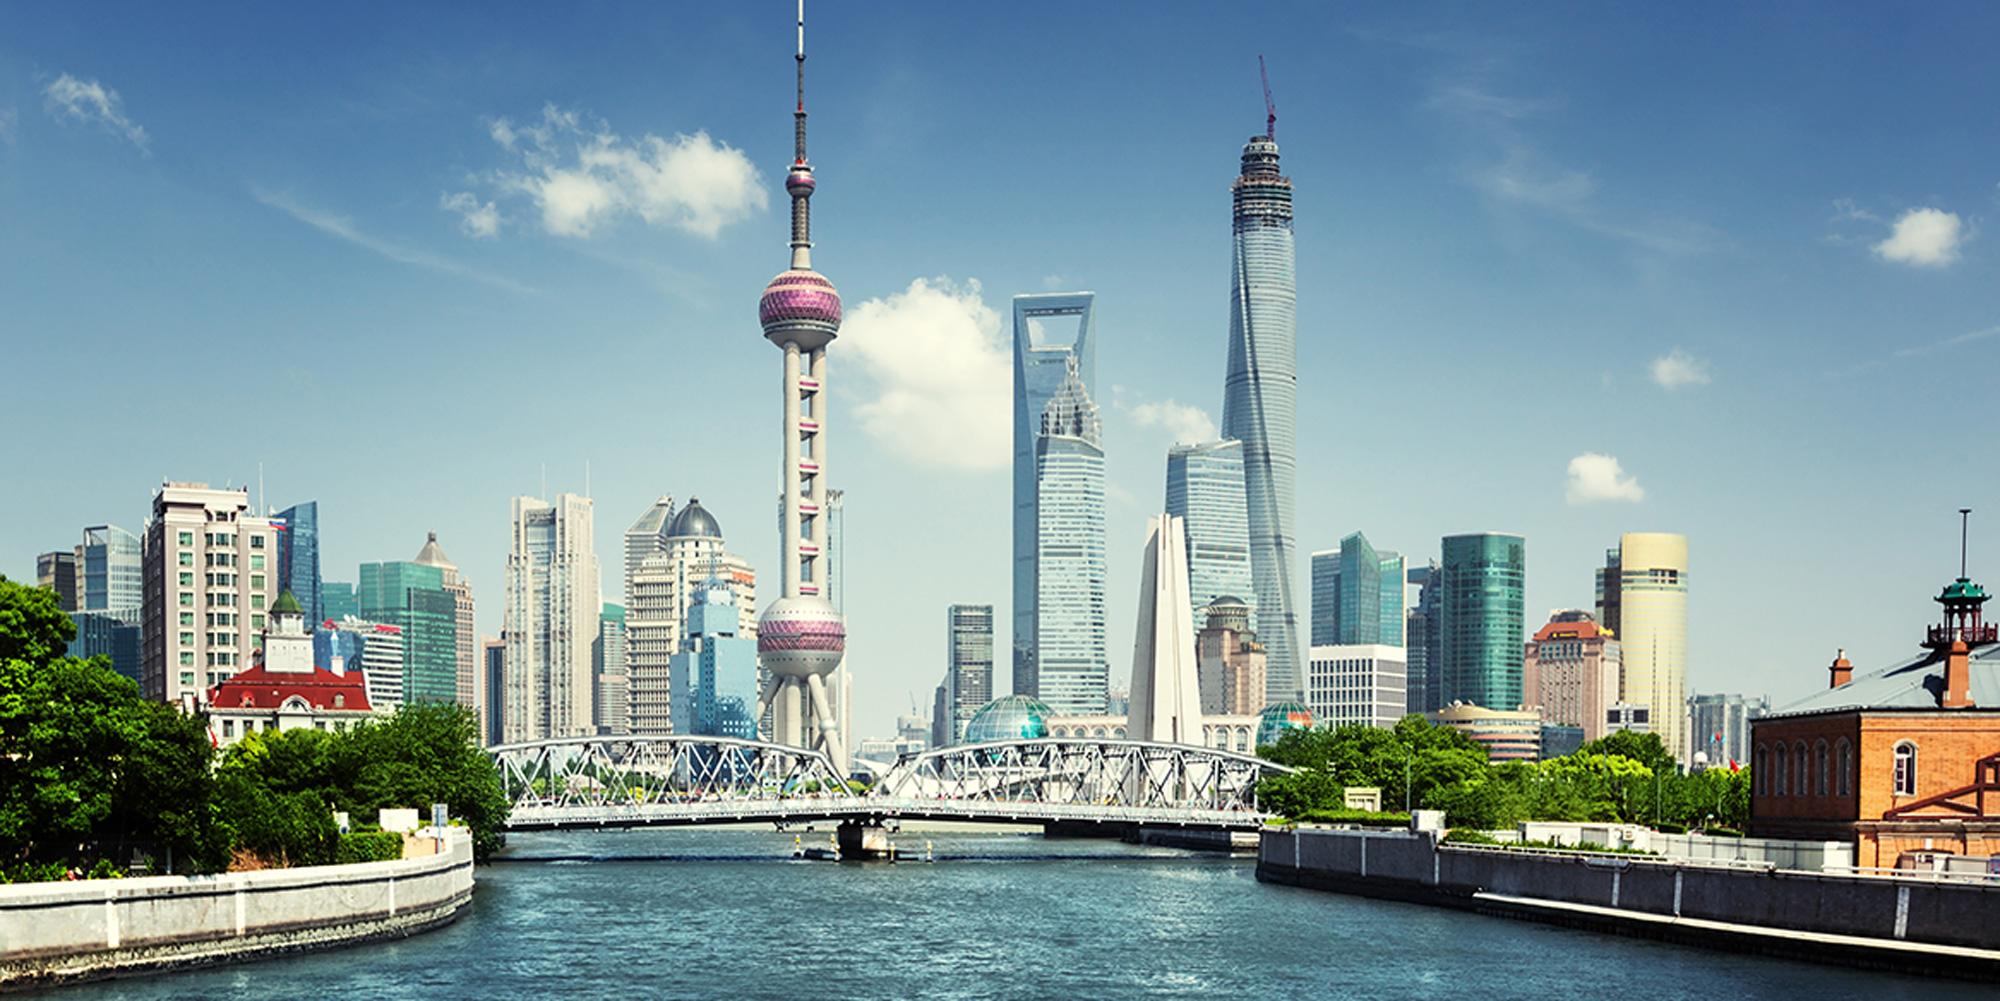 Asia's economic powerhouse: the family business